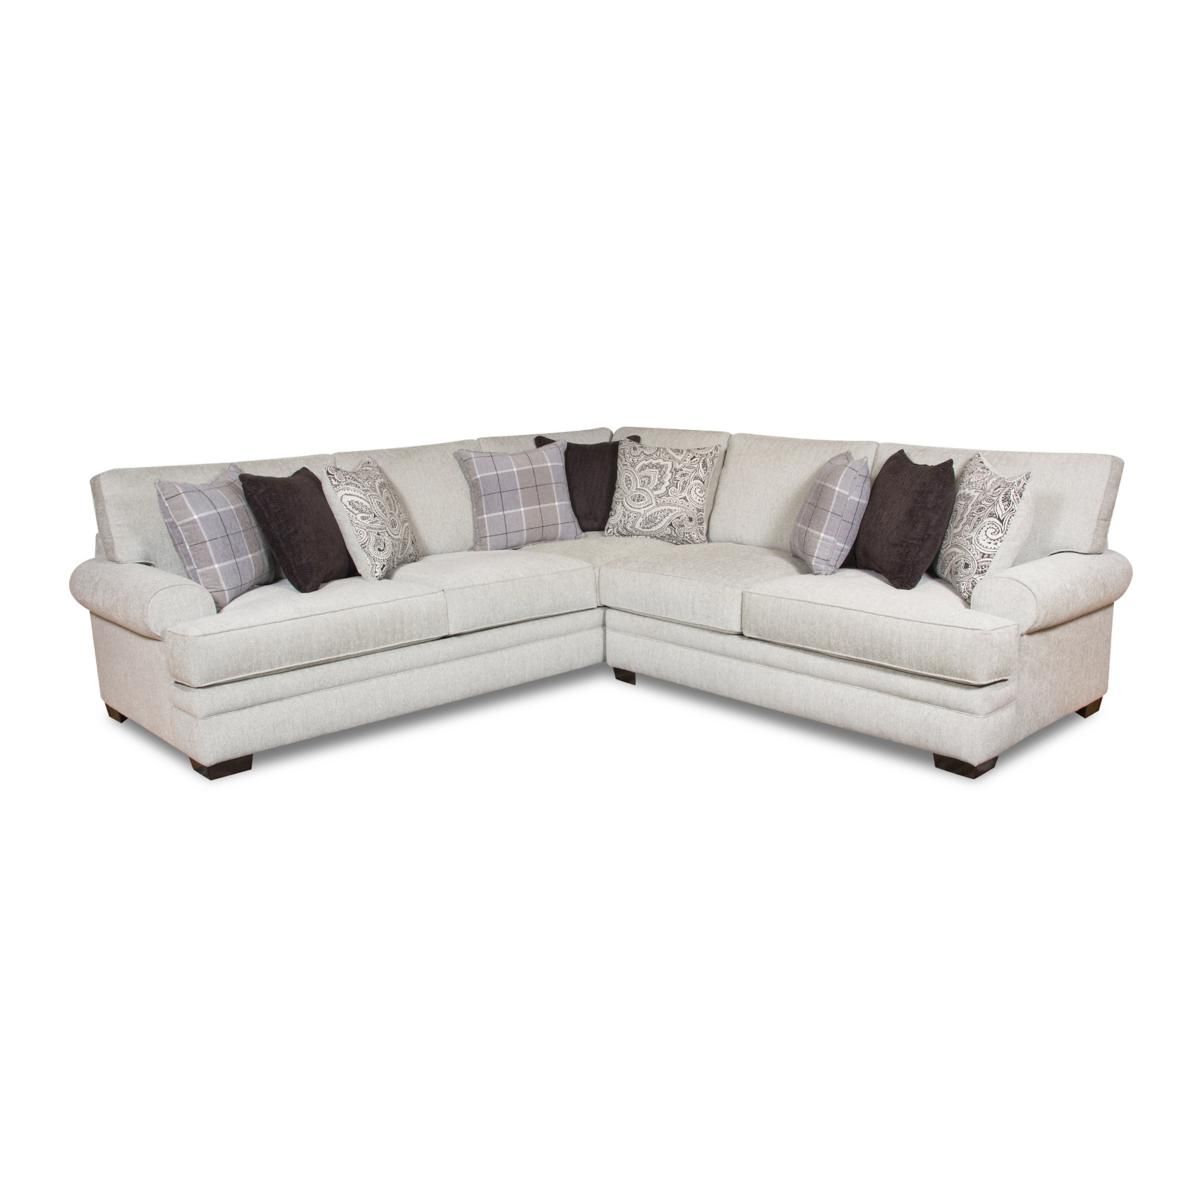 Phenomenal 837050 Kt 88625 En Us Ibusinesslaw Wood Chair Design Ideas Ibusinesslaworg